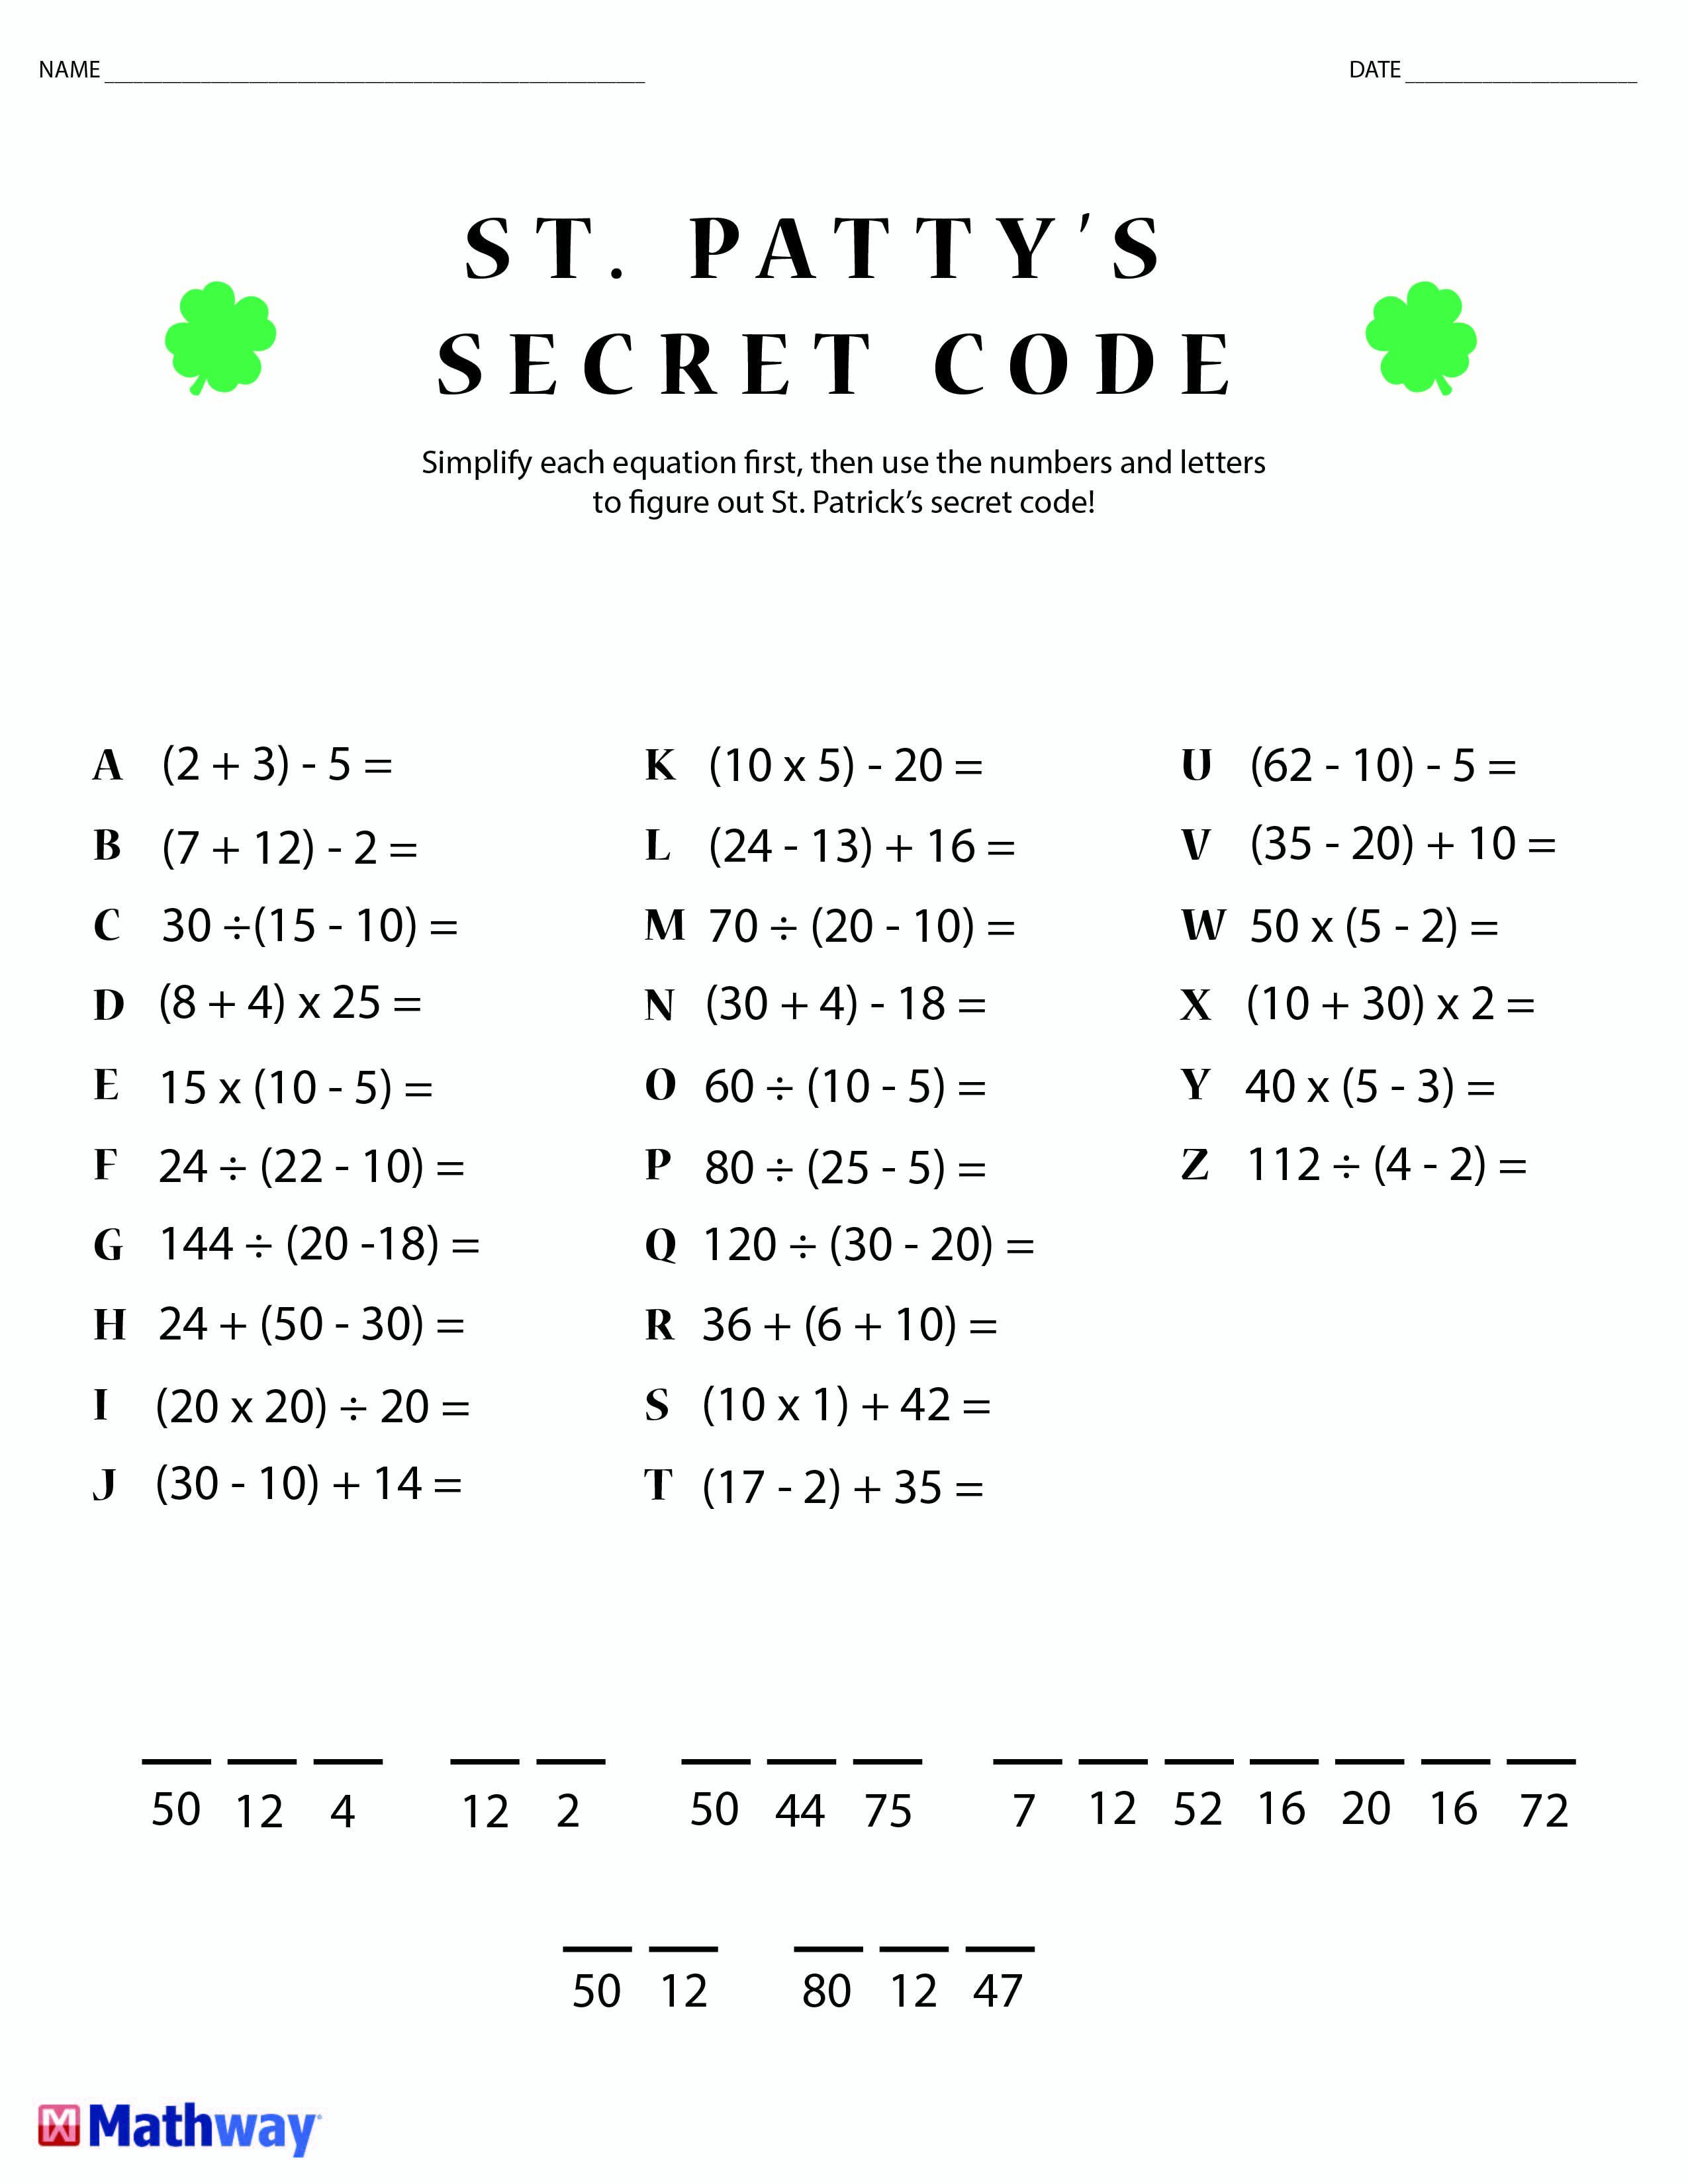 St. Patty's Day Crack The Secret Code Worksheet! Print This One Out   Crack The Code Worksheets Printable